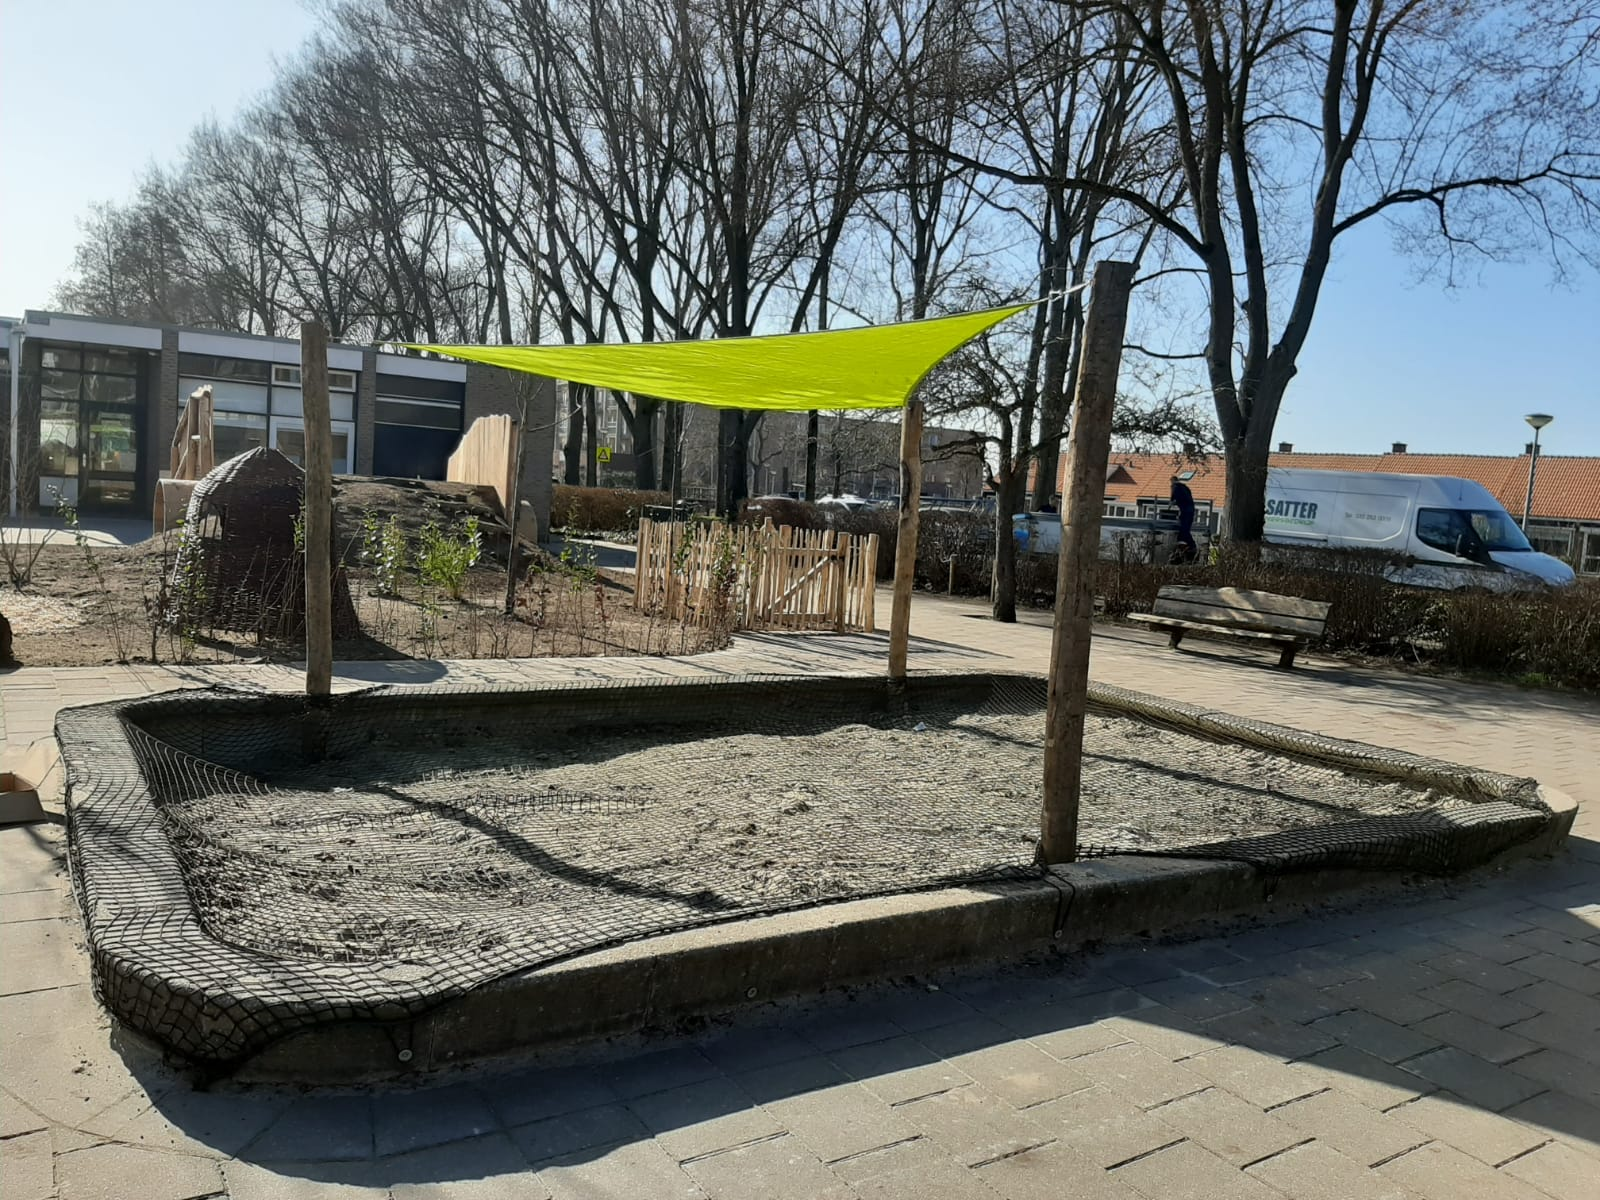 groen schoolplein satter zandbak